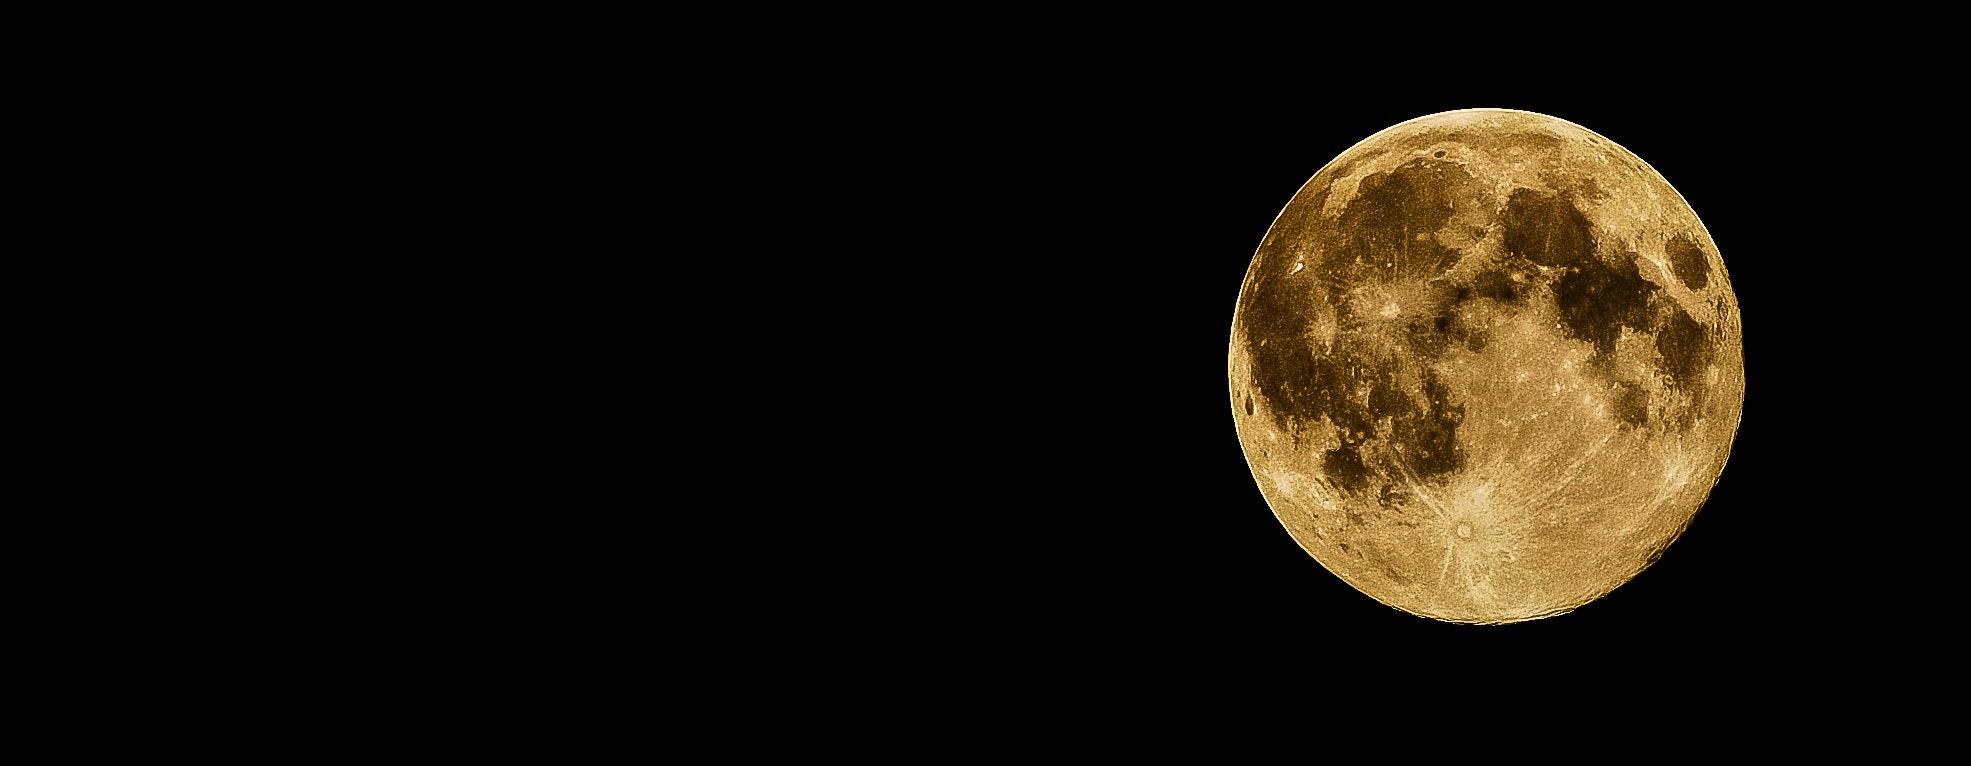 full-moon-moon-night-sky-53153.jpeg?cs=srgb&dl=-53153.jpg&fm=jpg